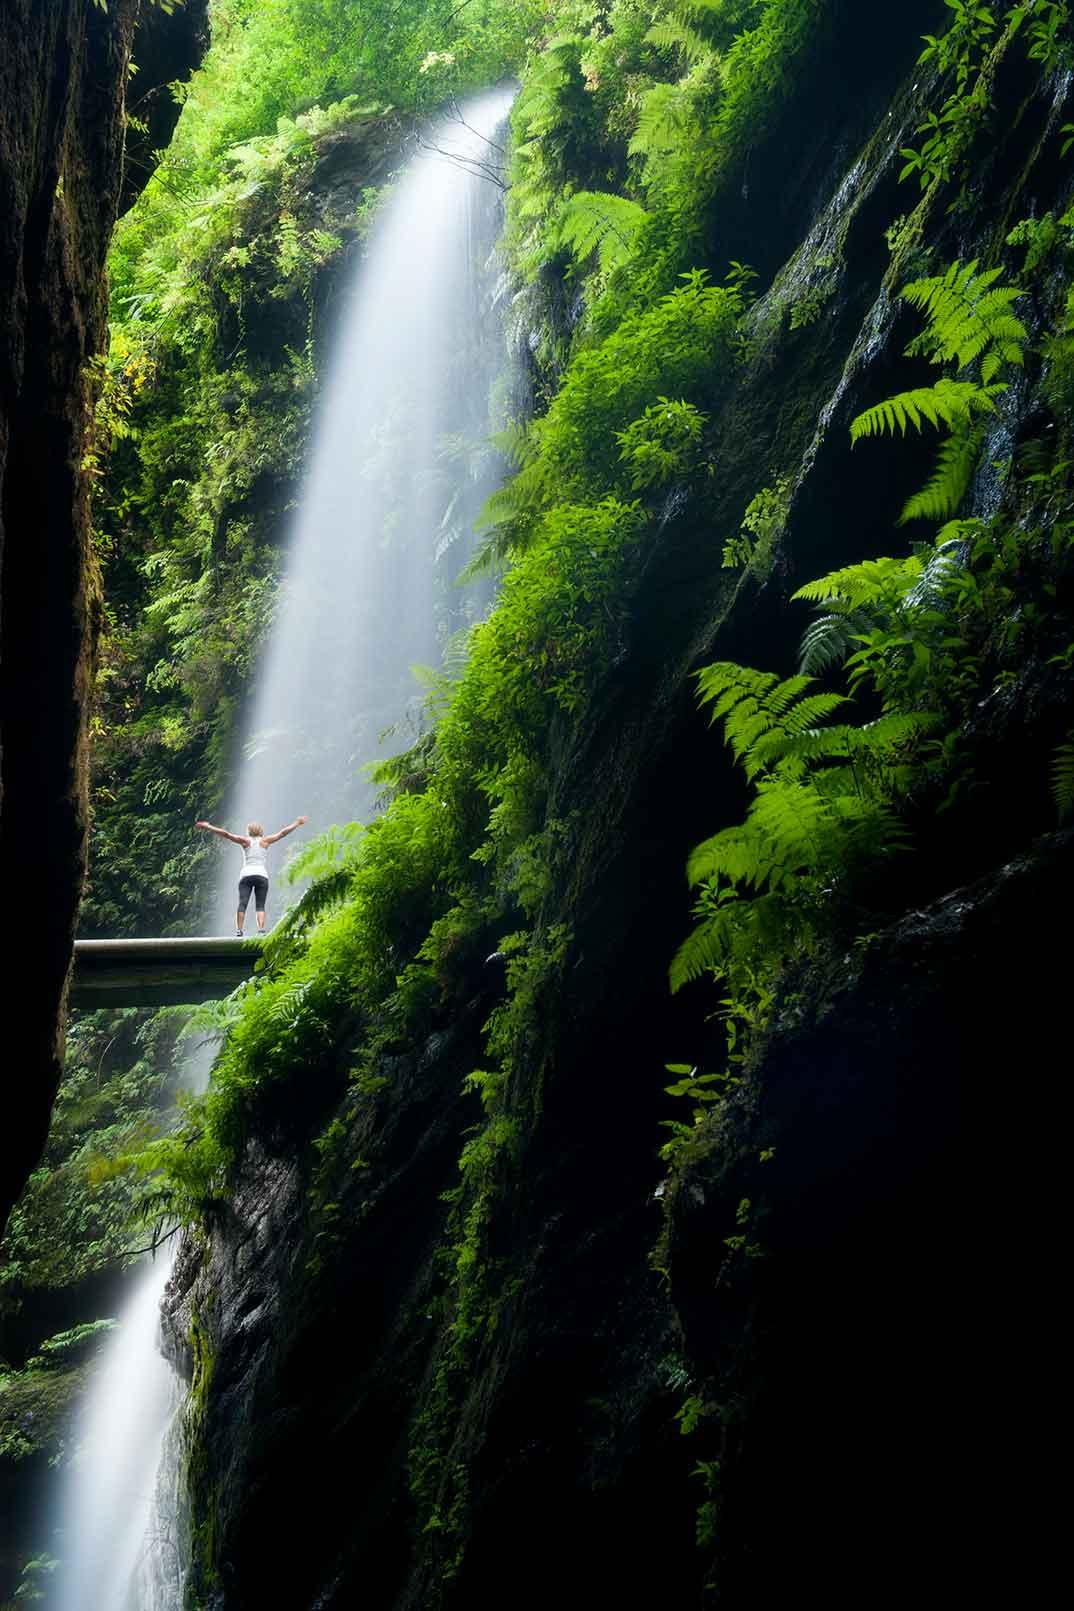 Cascada Los Tilos - La Palma © Saúl Santos